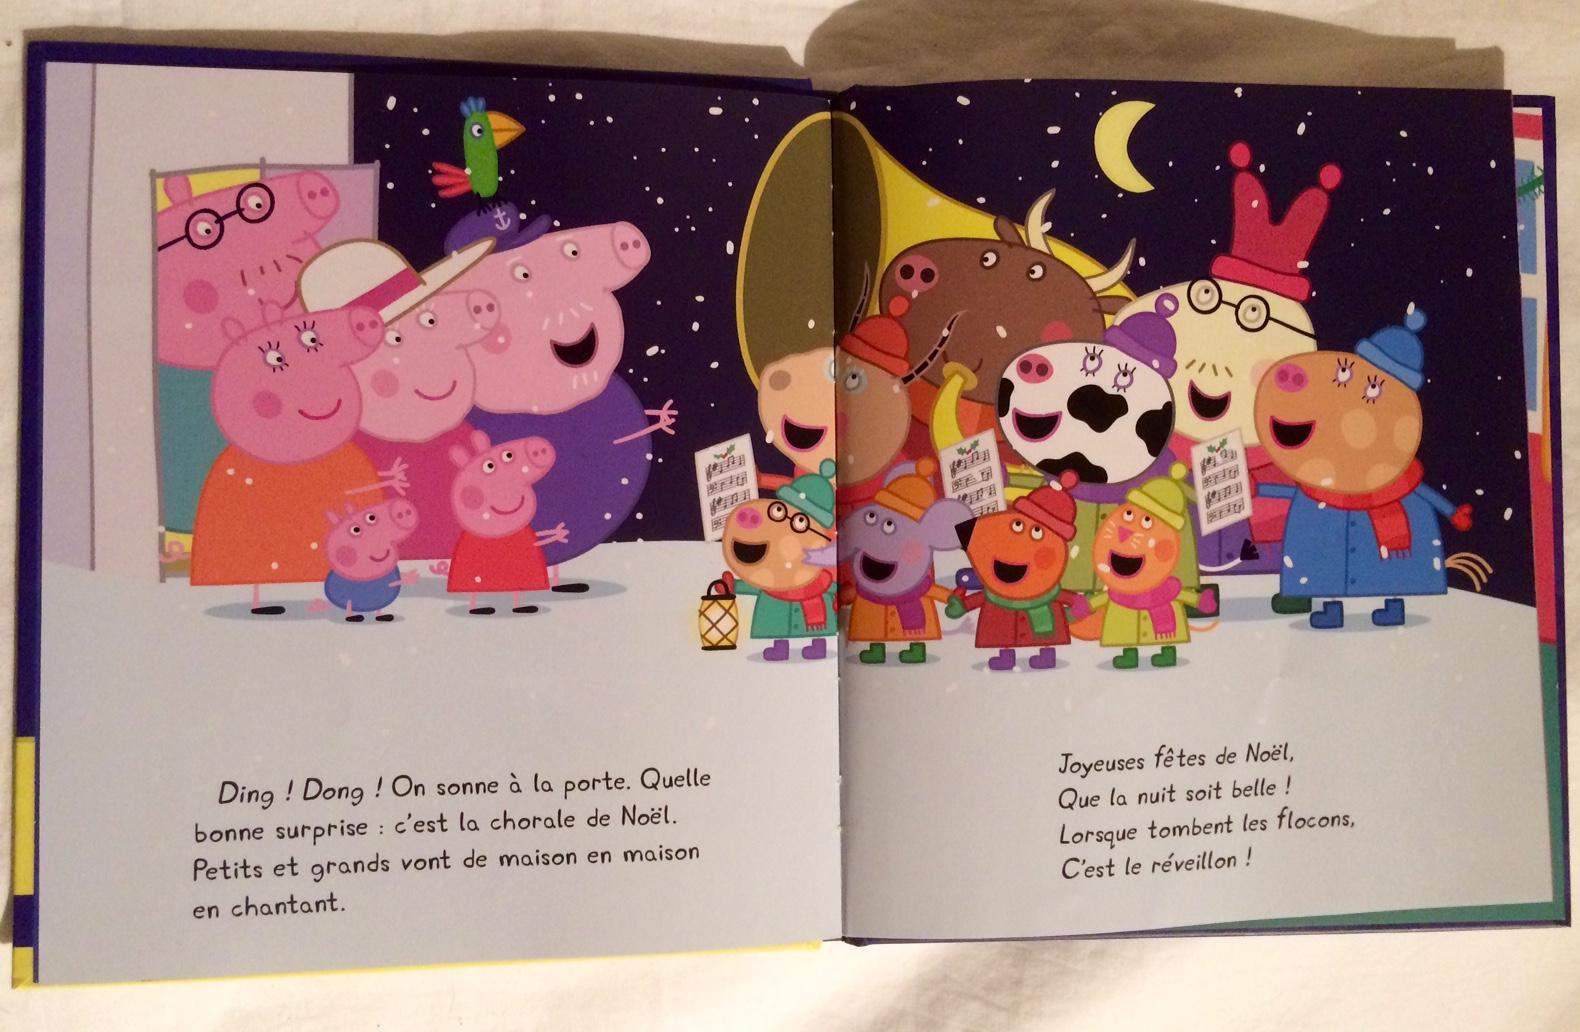 Pippa fête Noël extrait